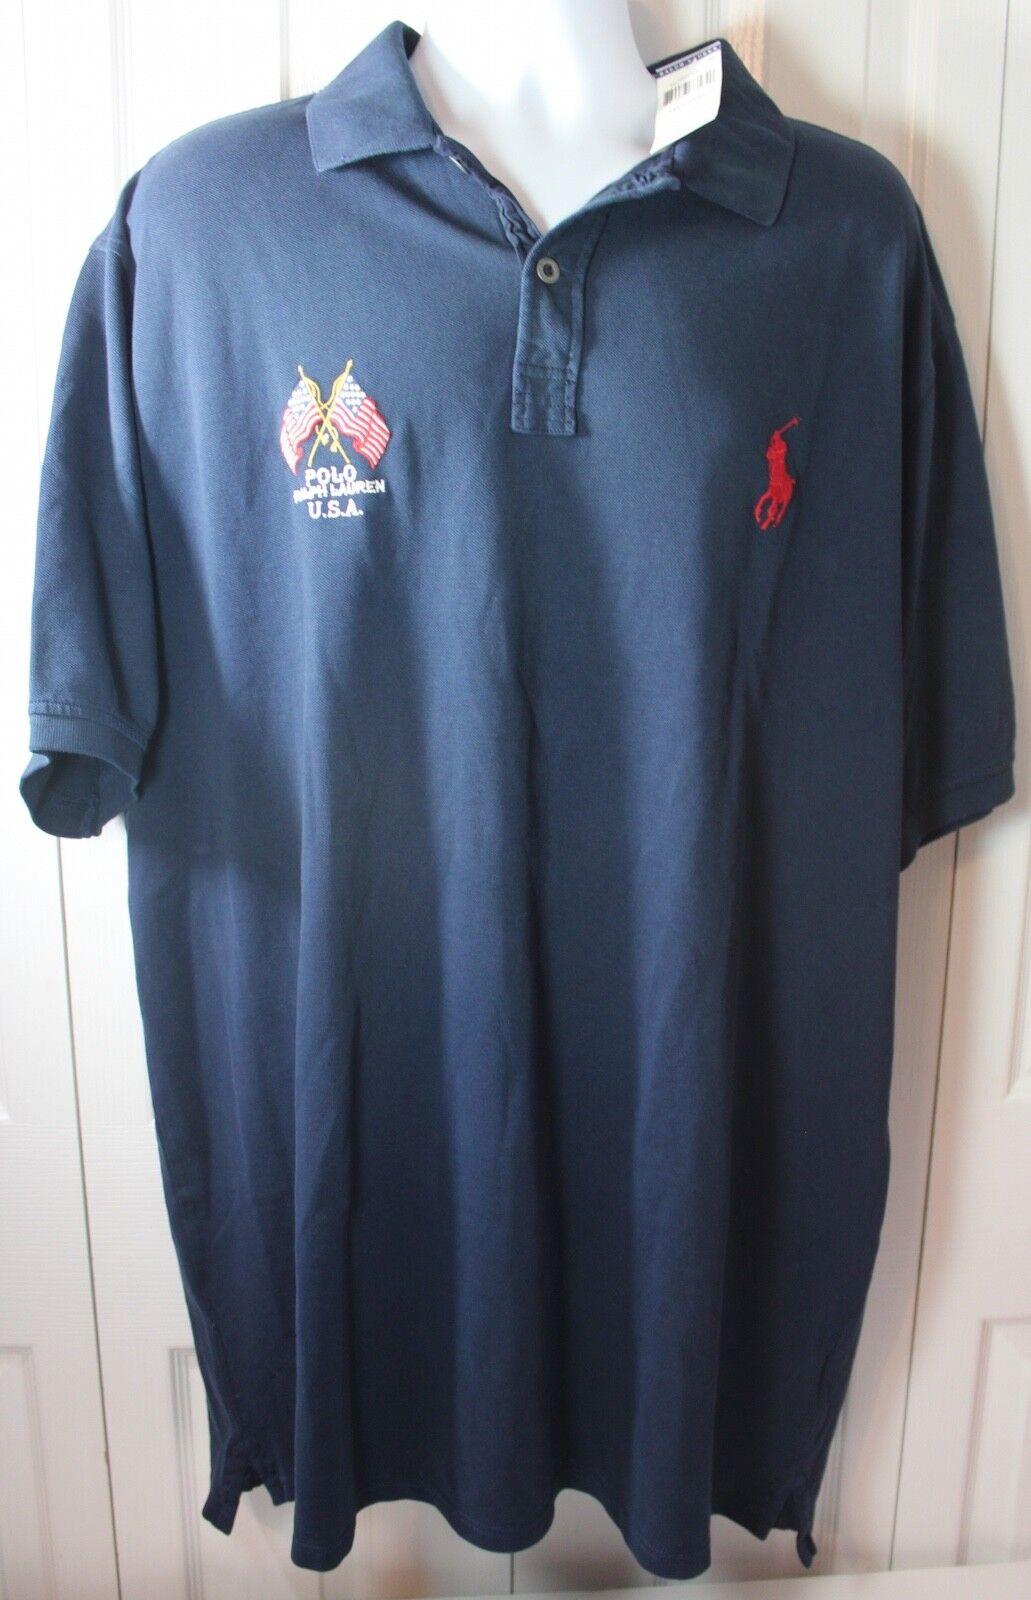 Polo Ralph Lauren 2XLT EAGLE American Flag Polo Shirt NWT MSRP